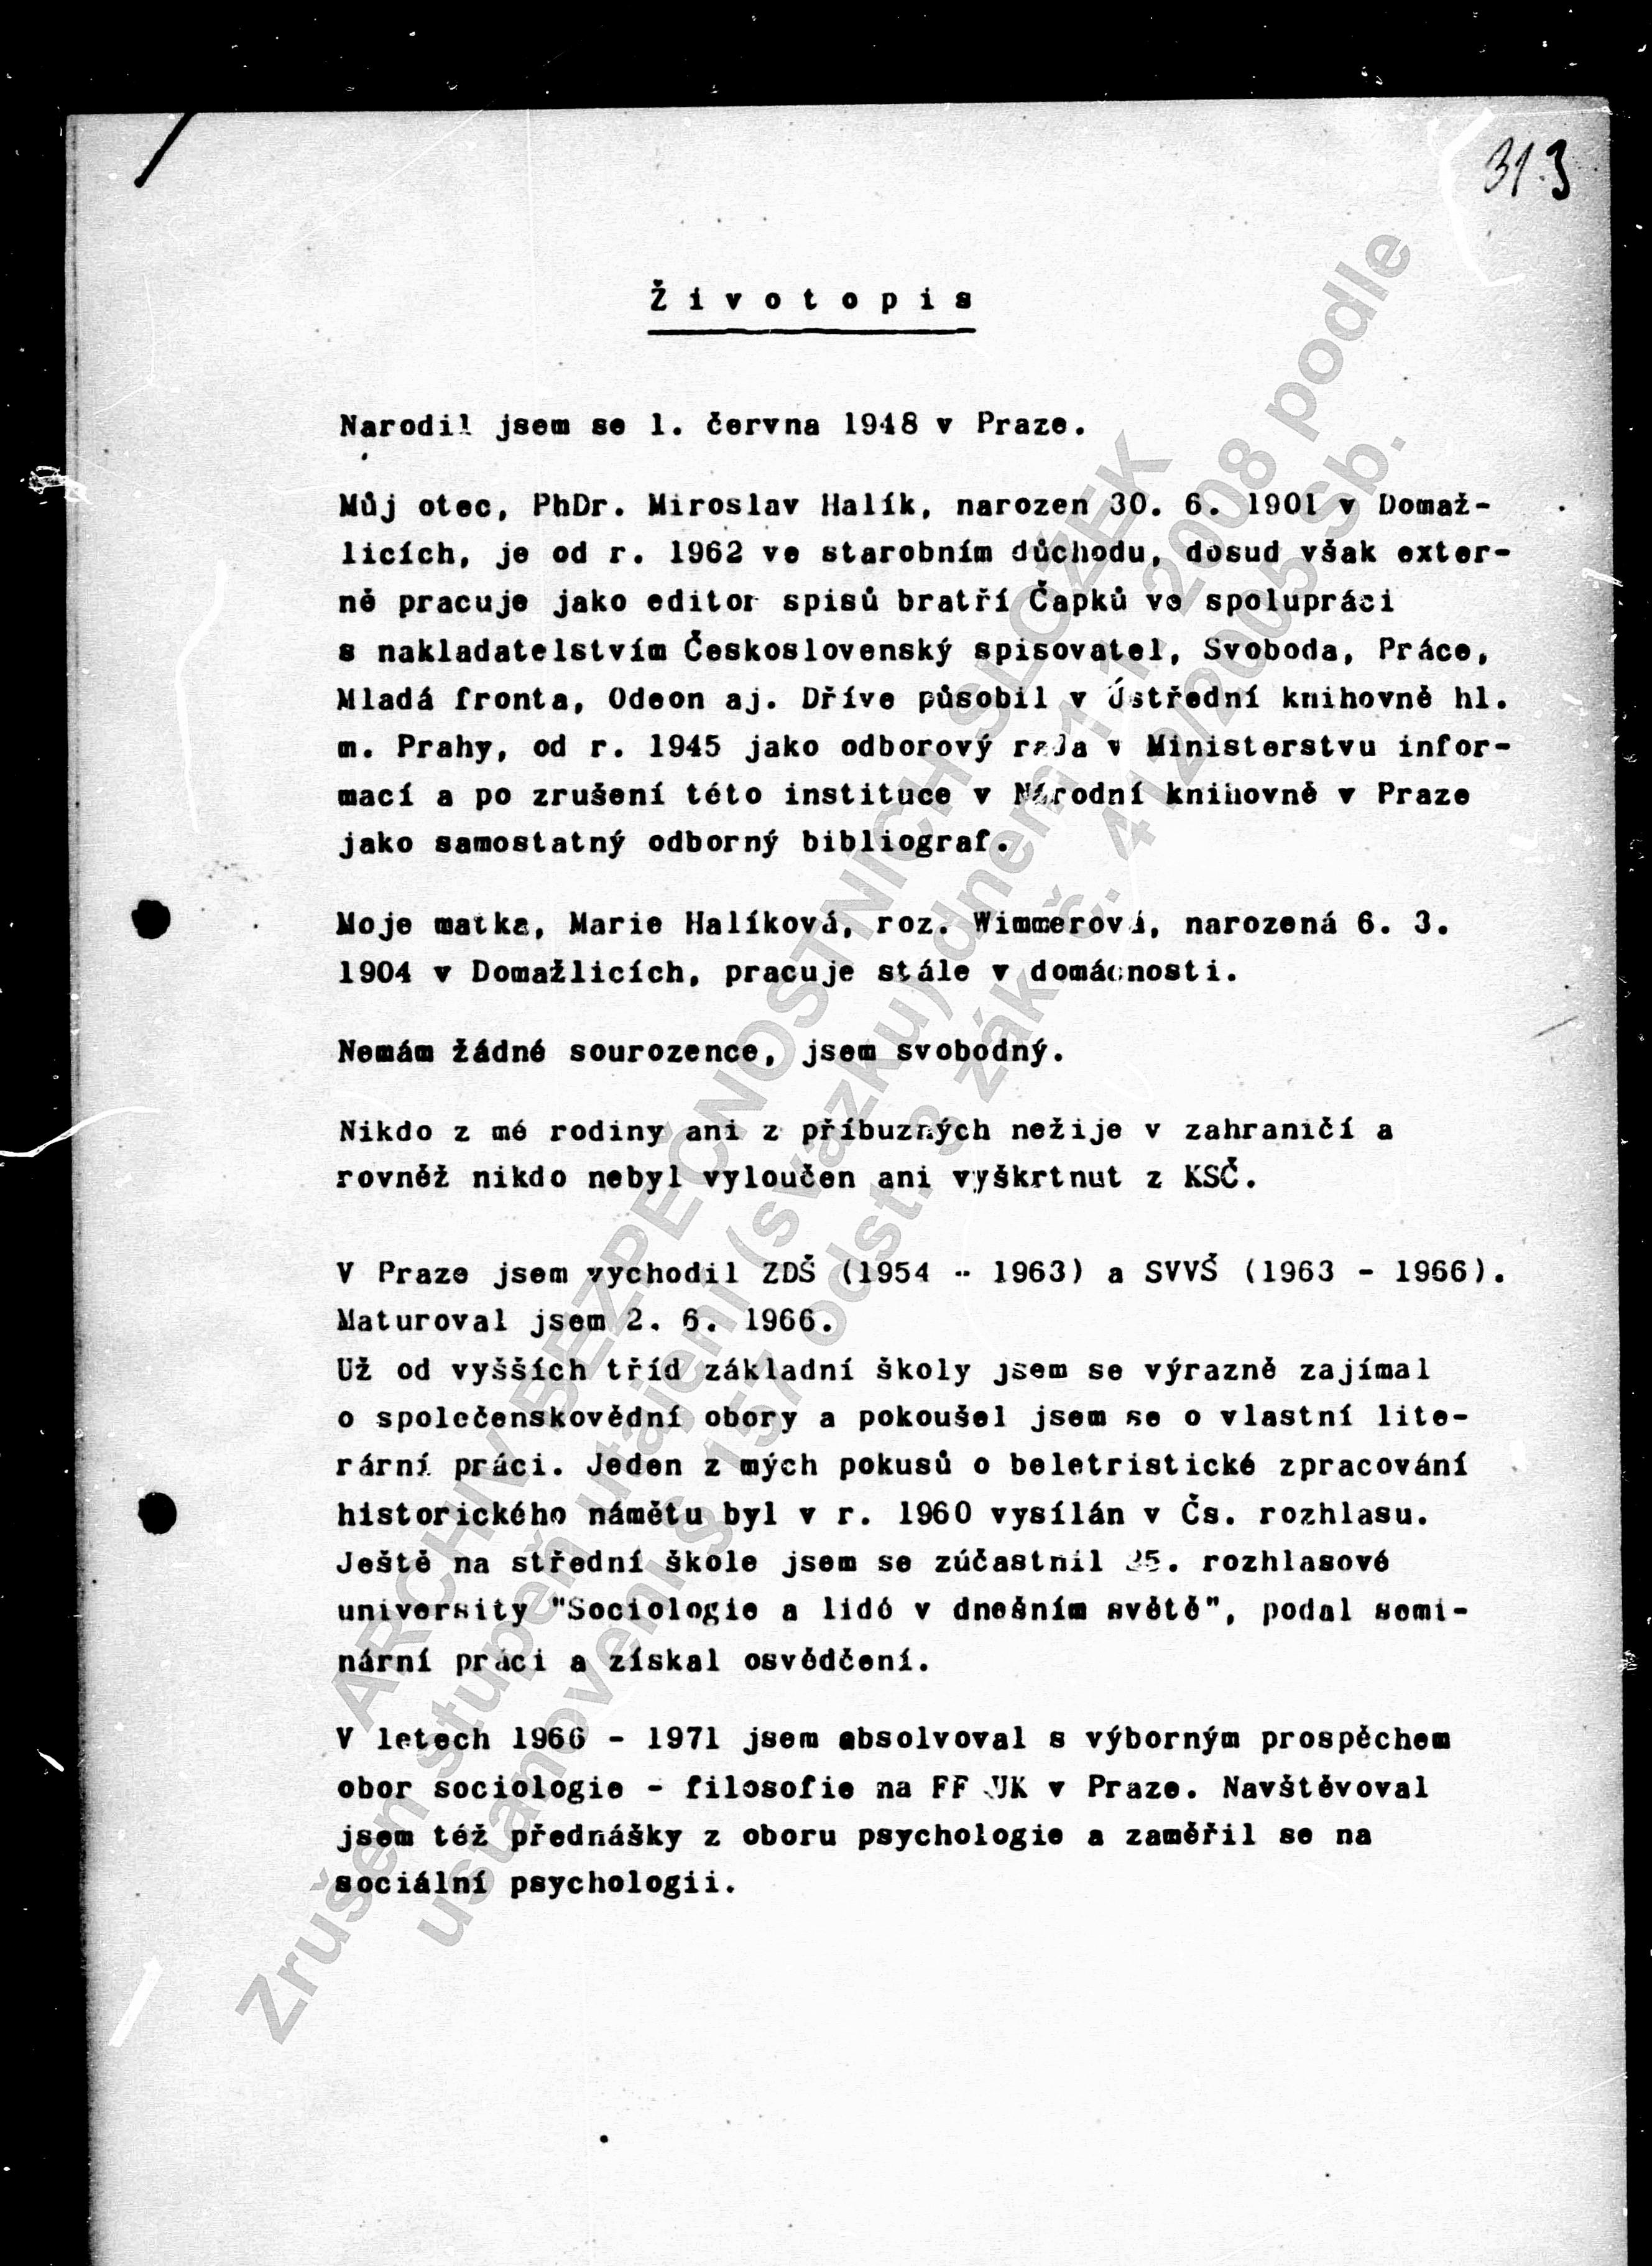 Životopis Halík 1975 (1)